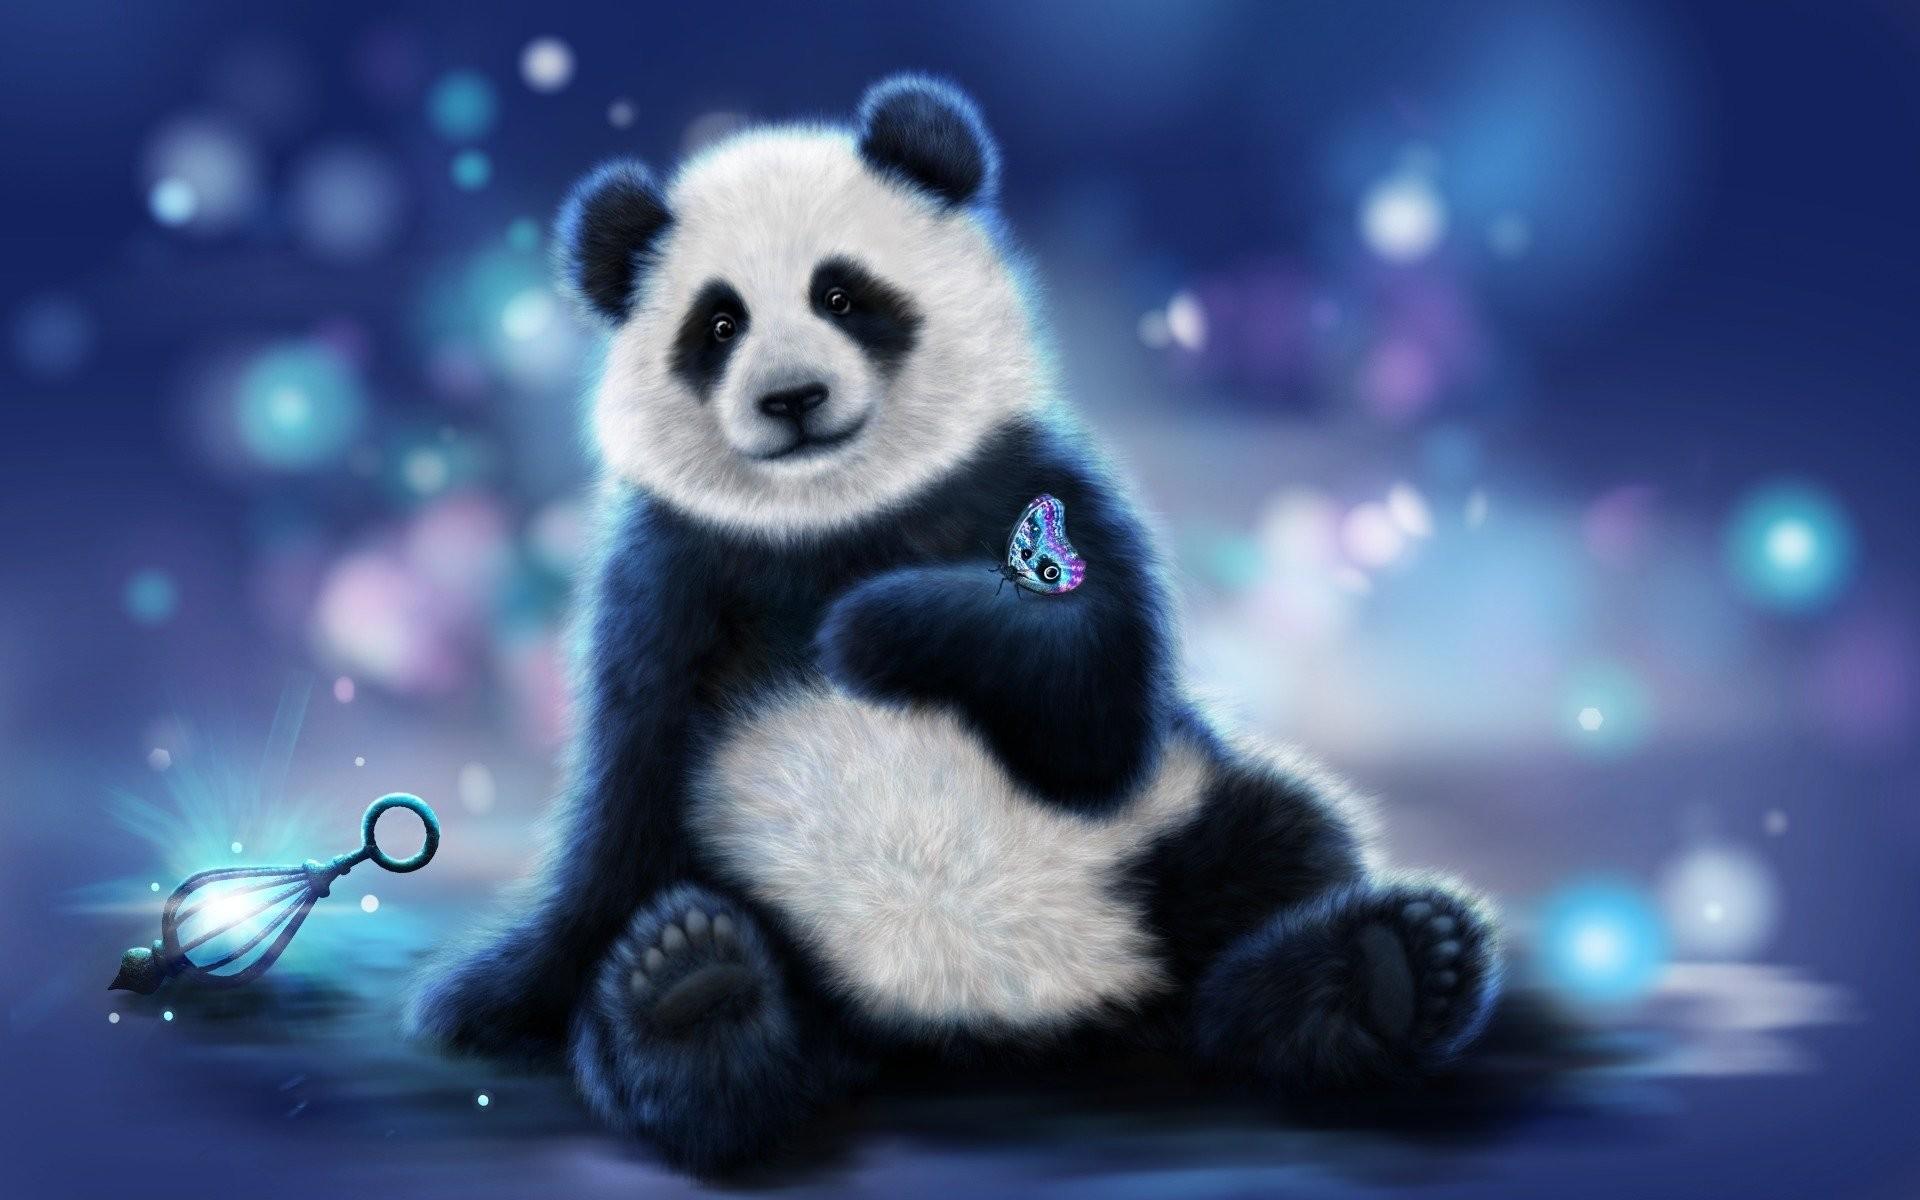 hinh gau truc panda 31